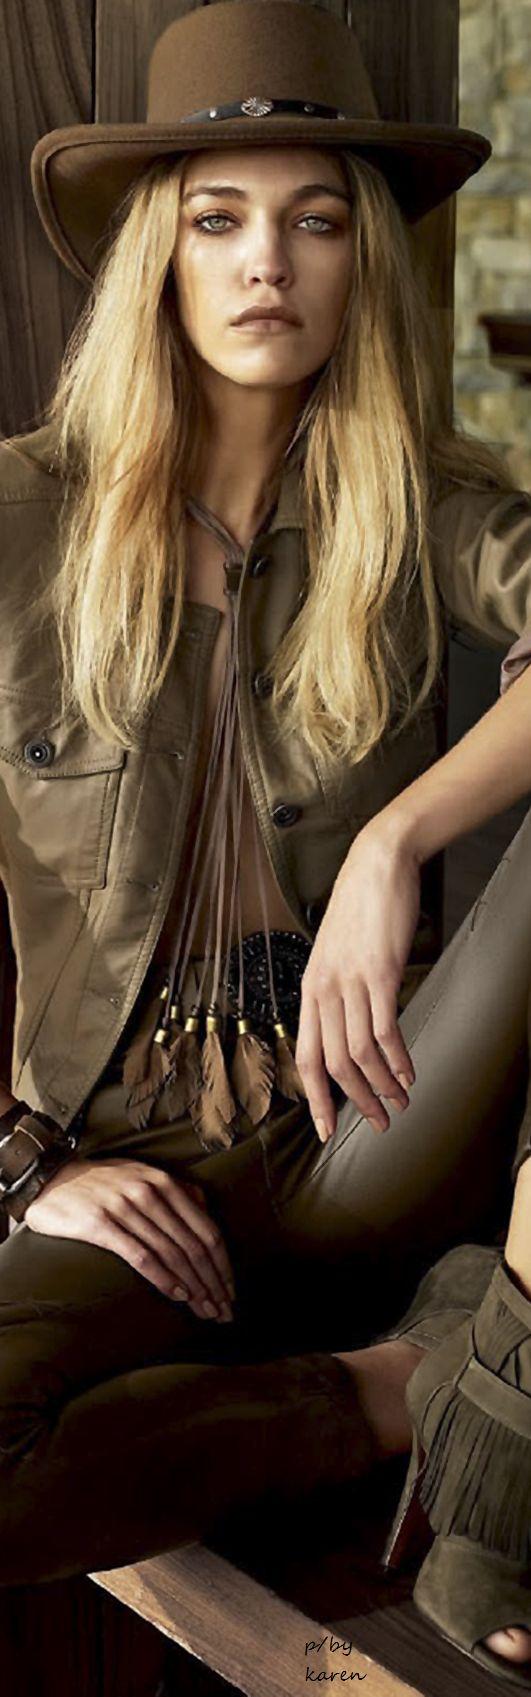 Diamond Cowgirl ~ Samantha Gradoville by JR Duran for Vogue